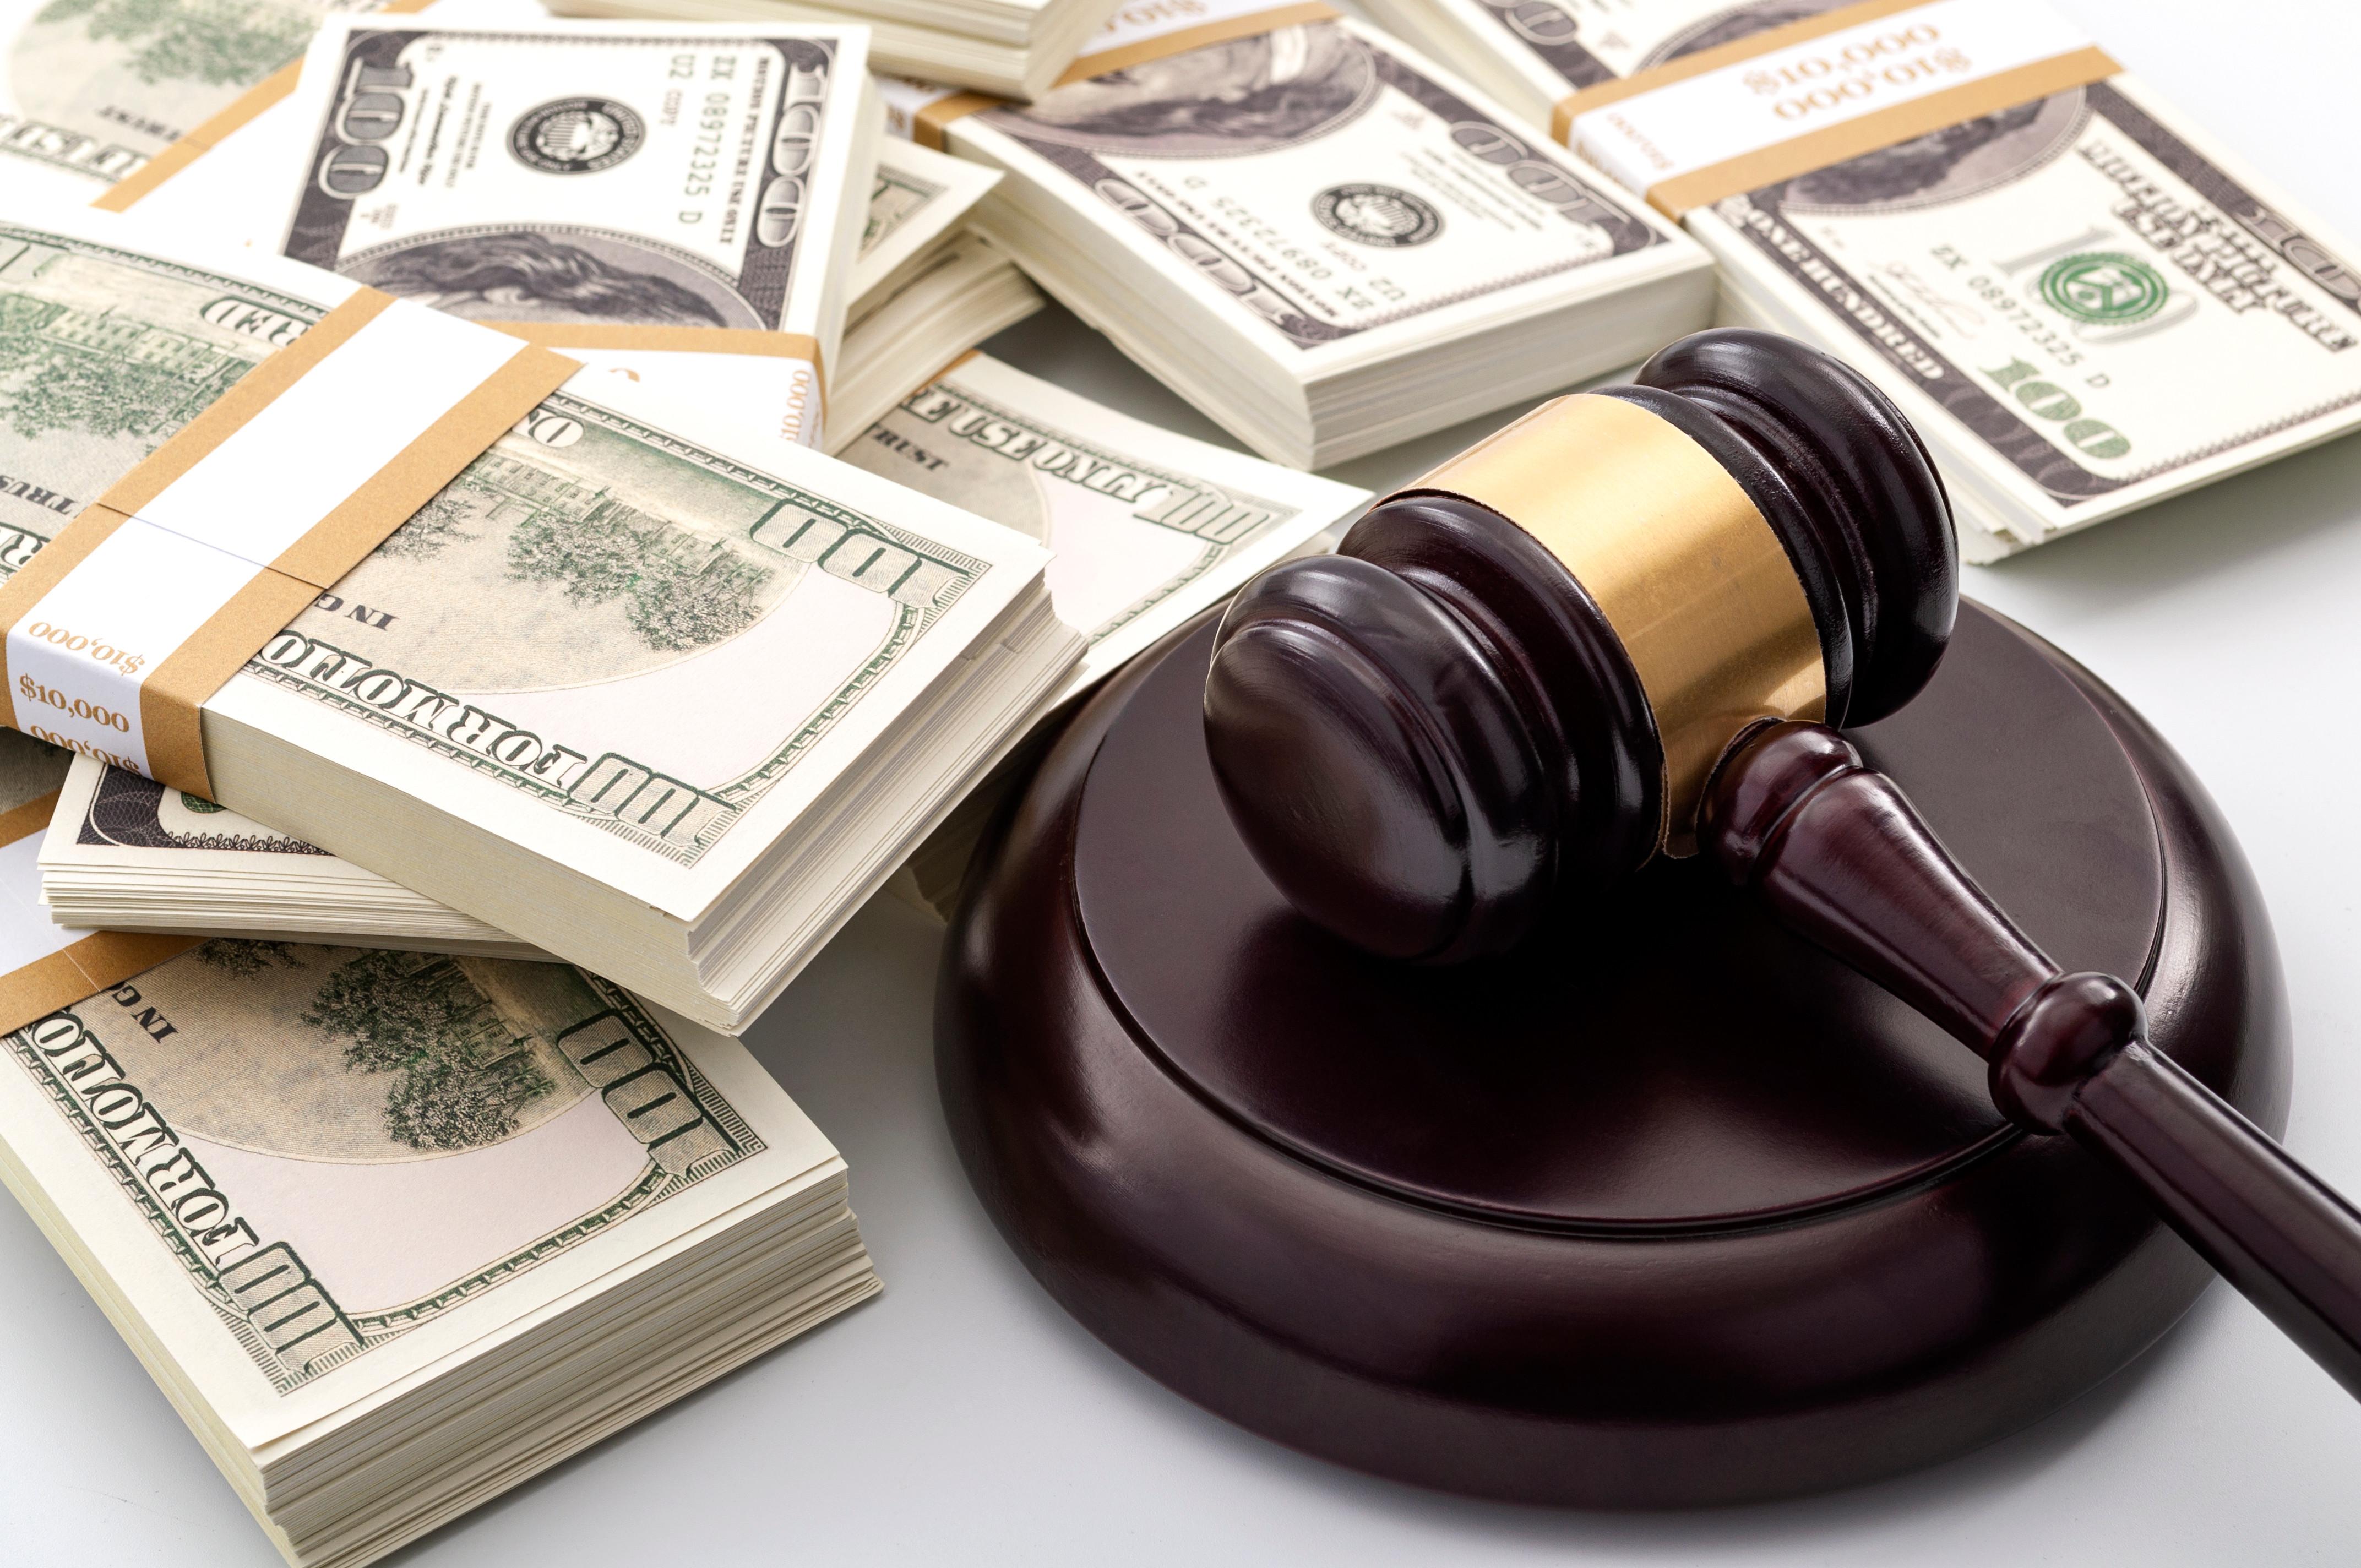 Estate Sale & Liquidations Services